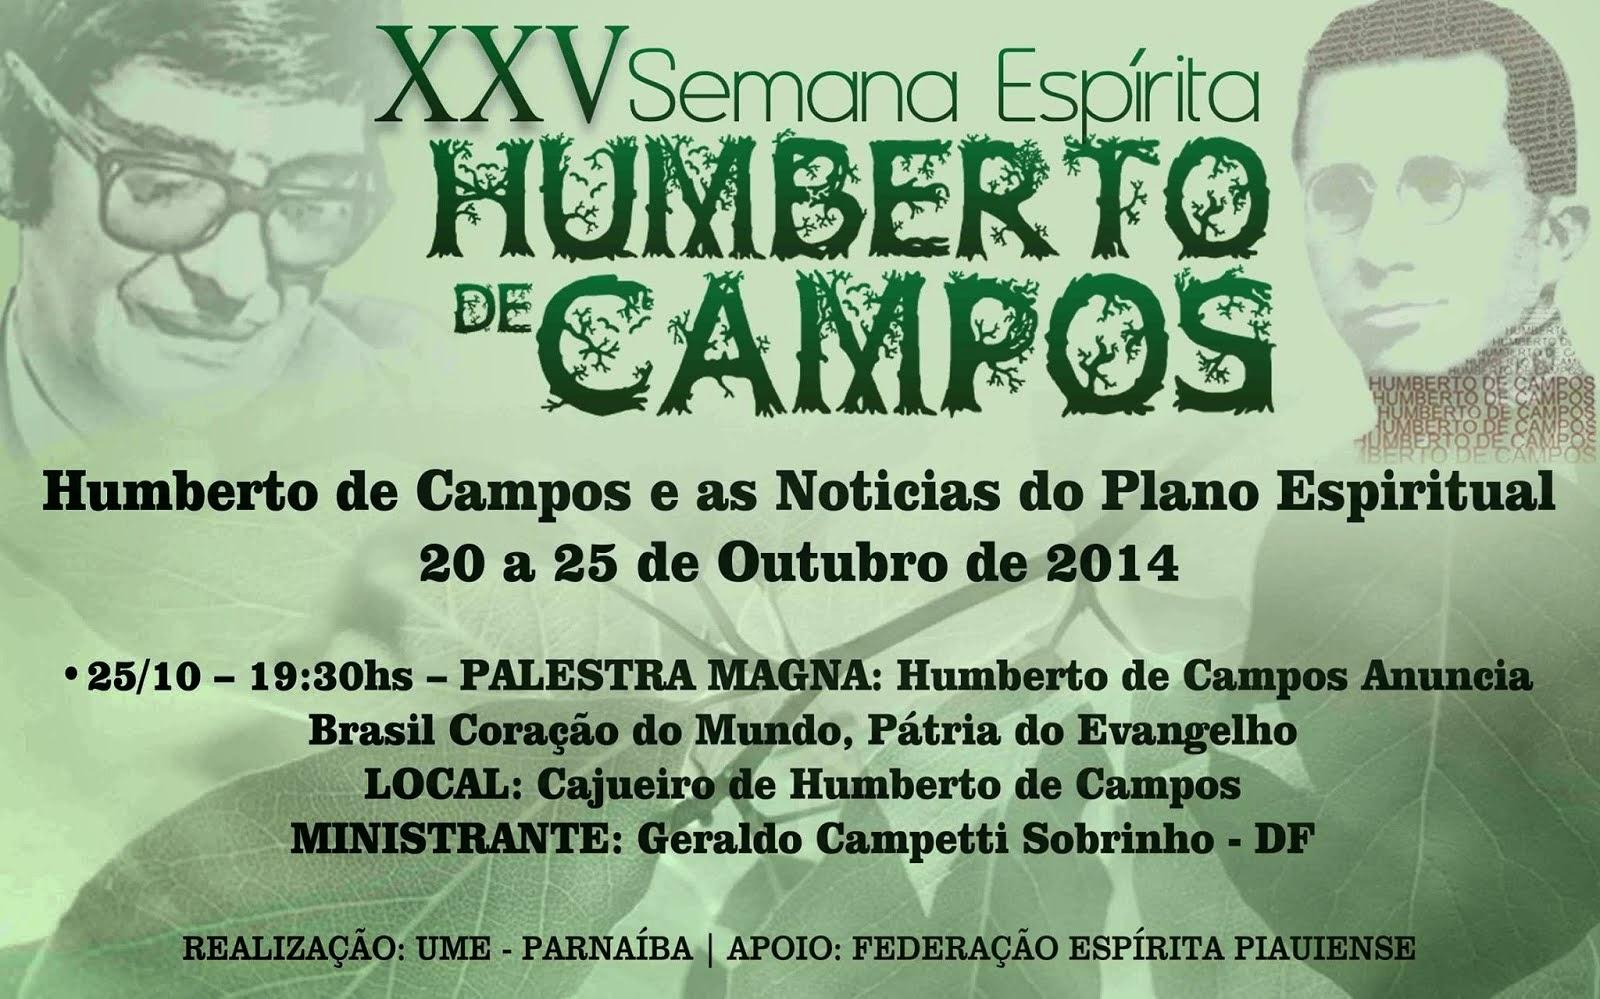 XXV Semana Espírita Humberto de Campos